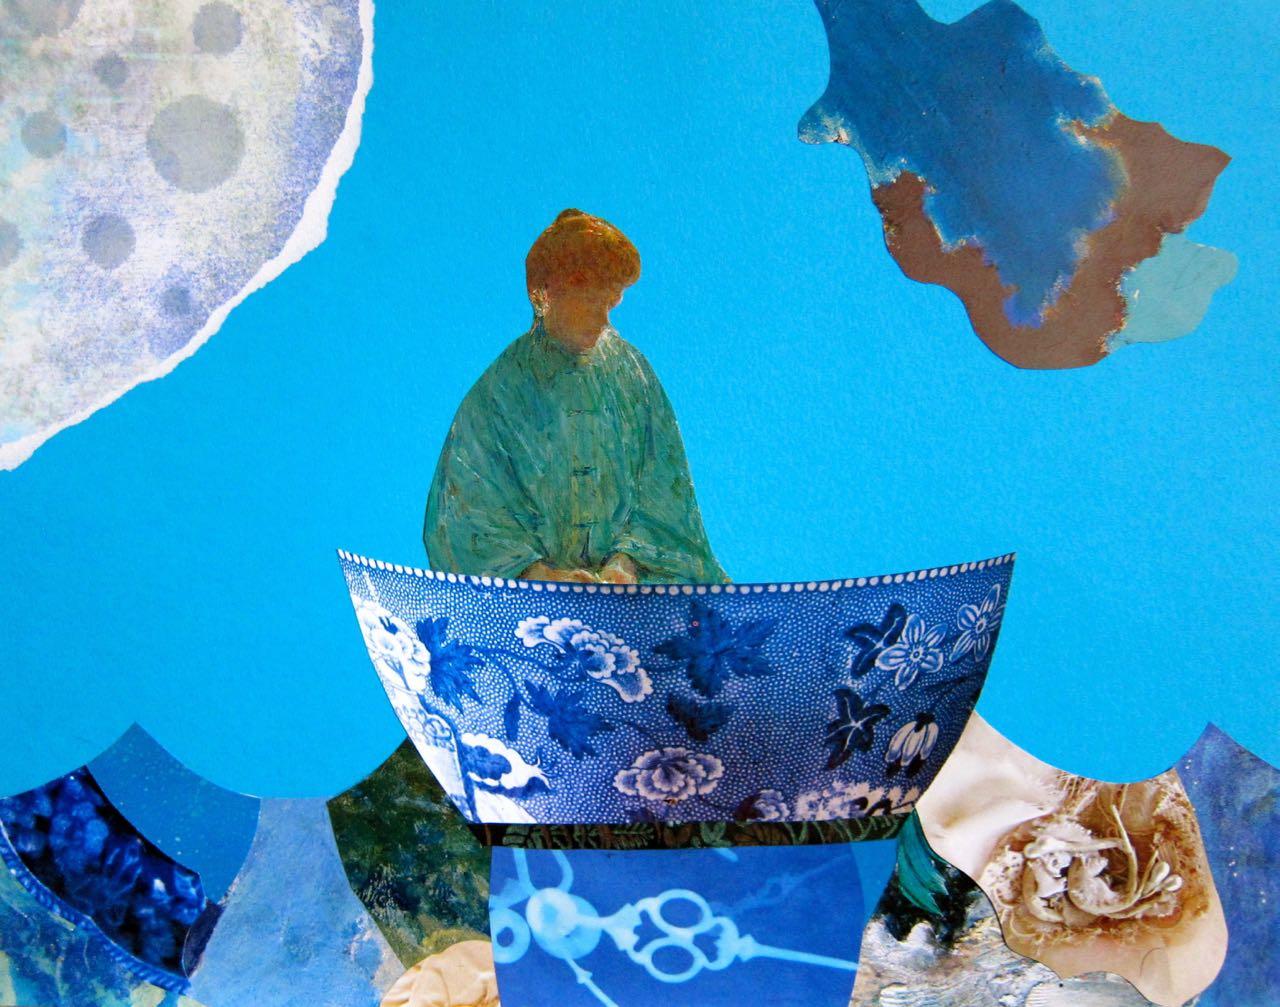 Pottery Bowl of Solitude, Catherine Raine 2014